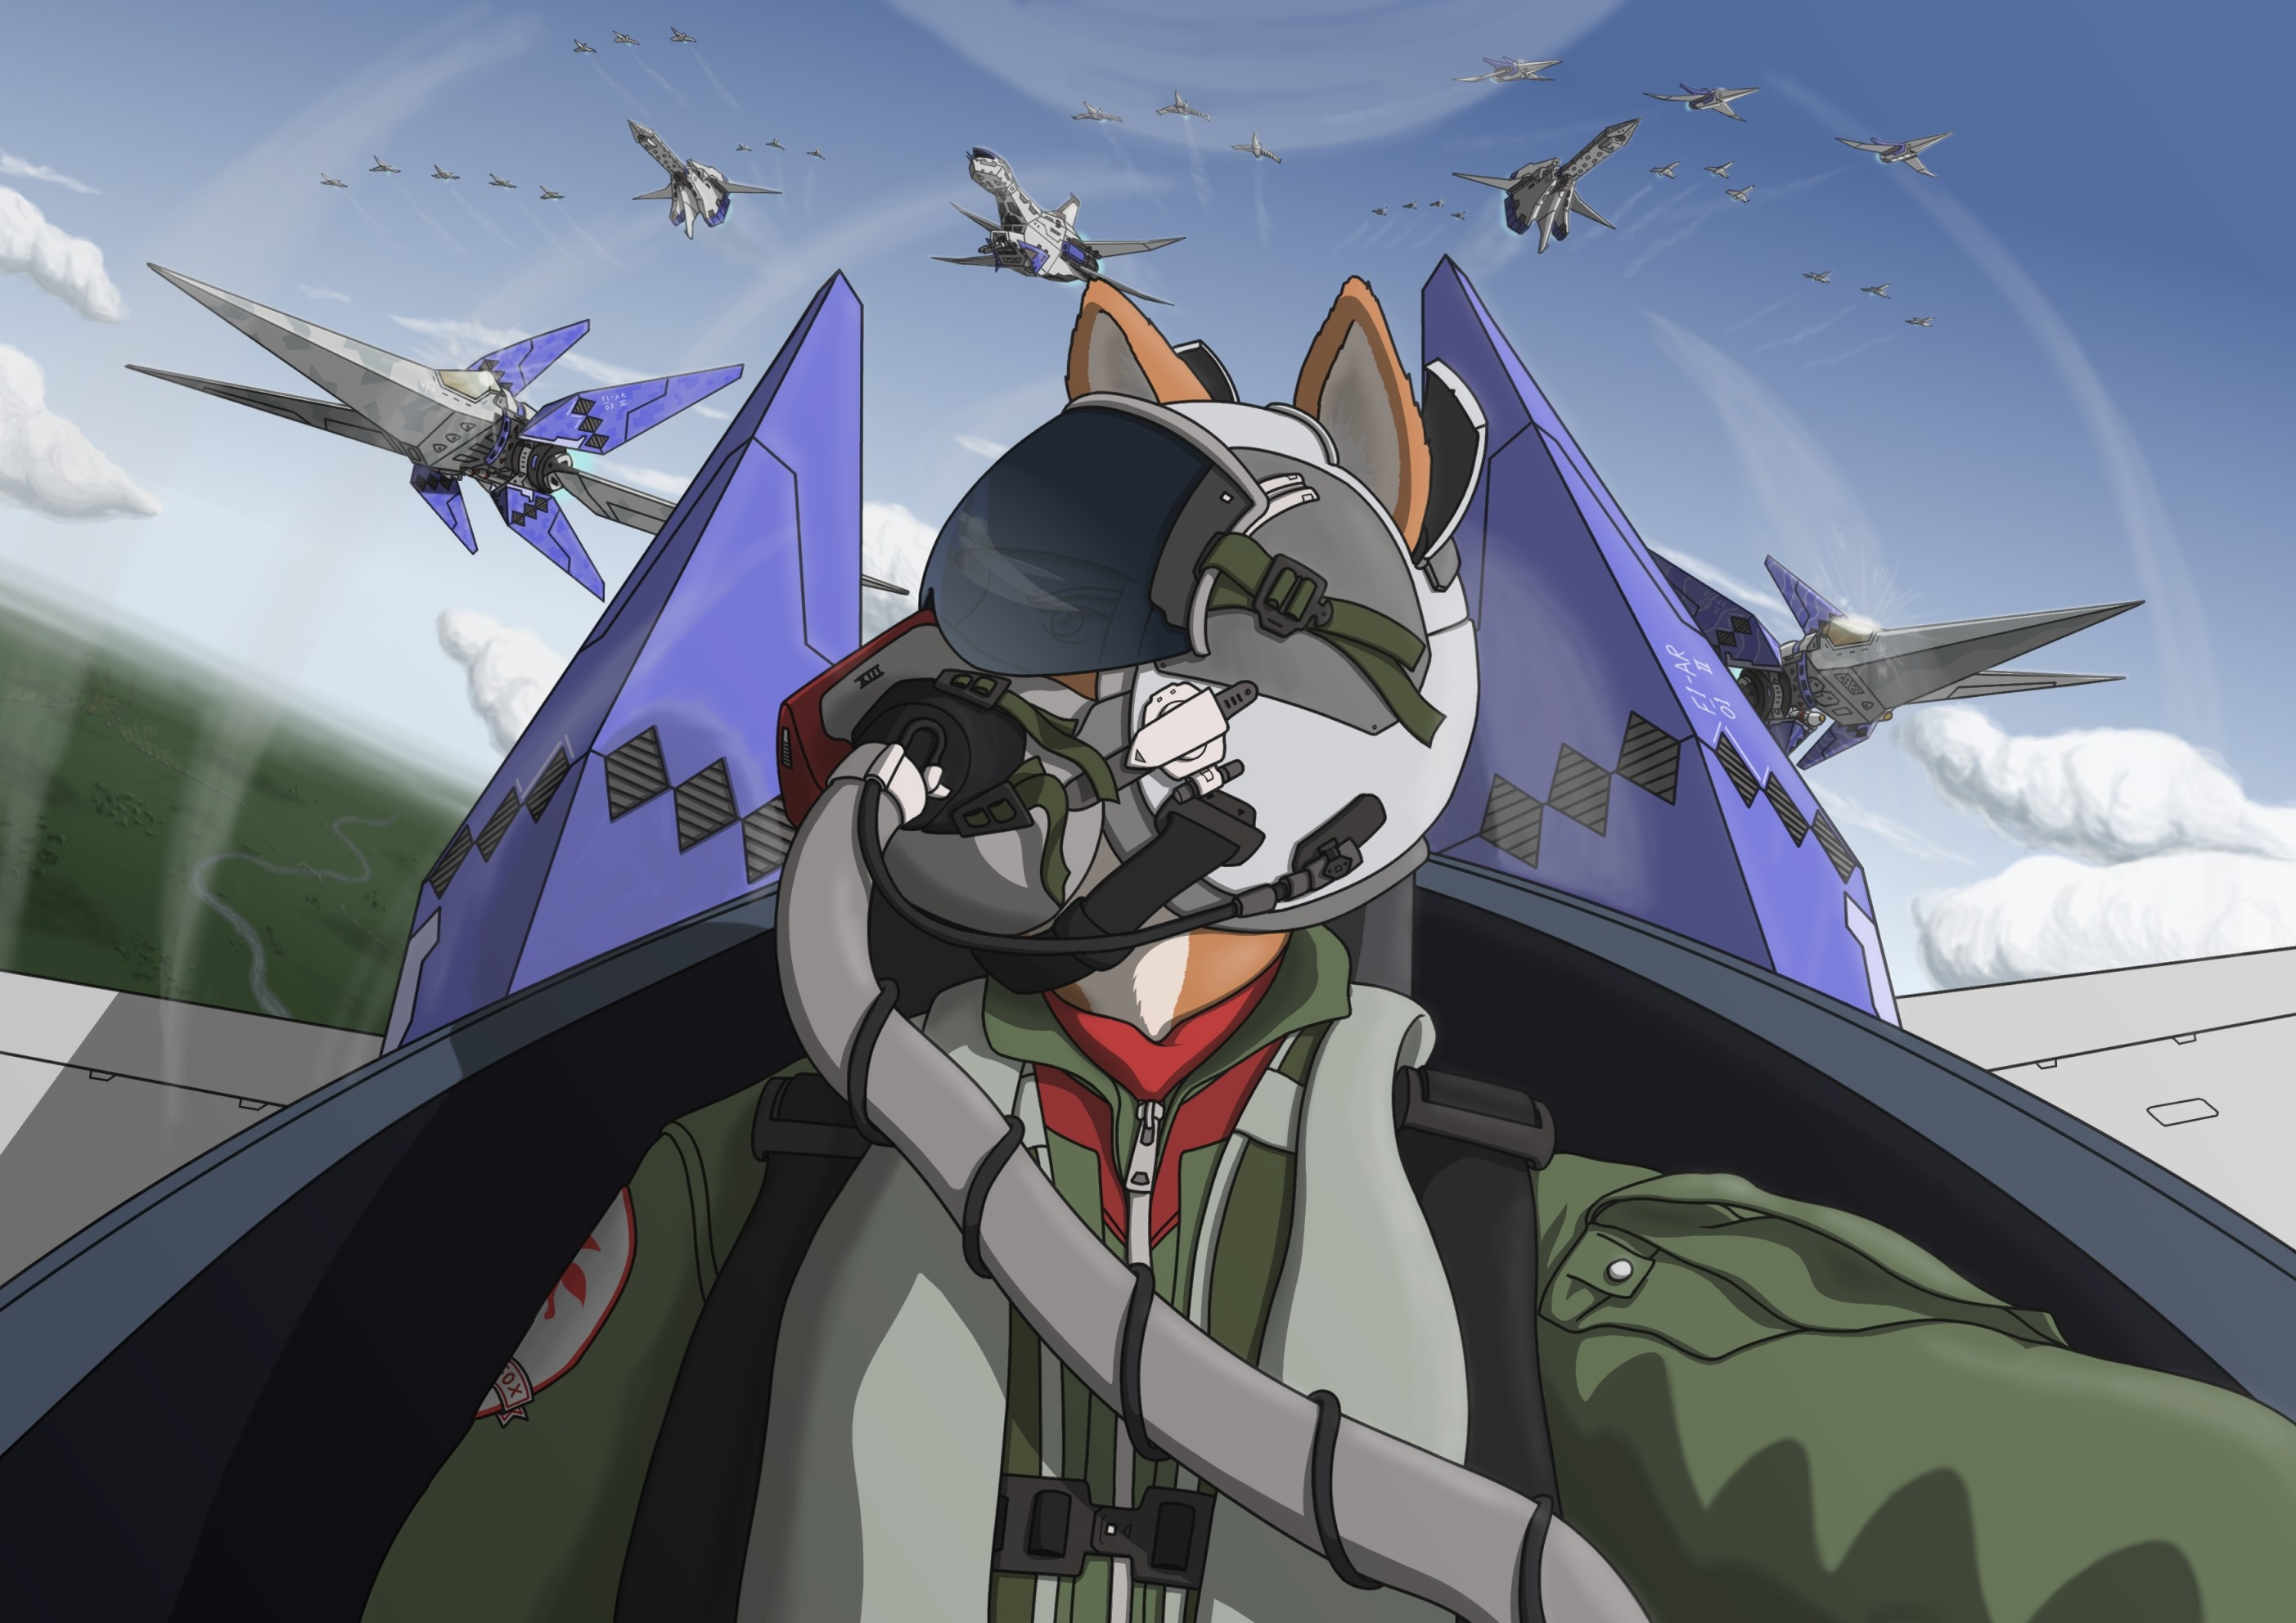 … ManusExtraordinarii Star Fox: Aerial Offensive by ManusExtraordinarii